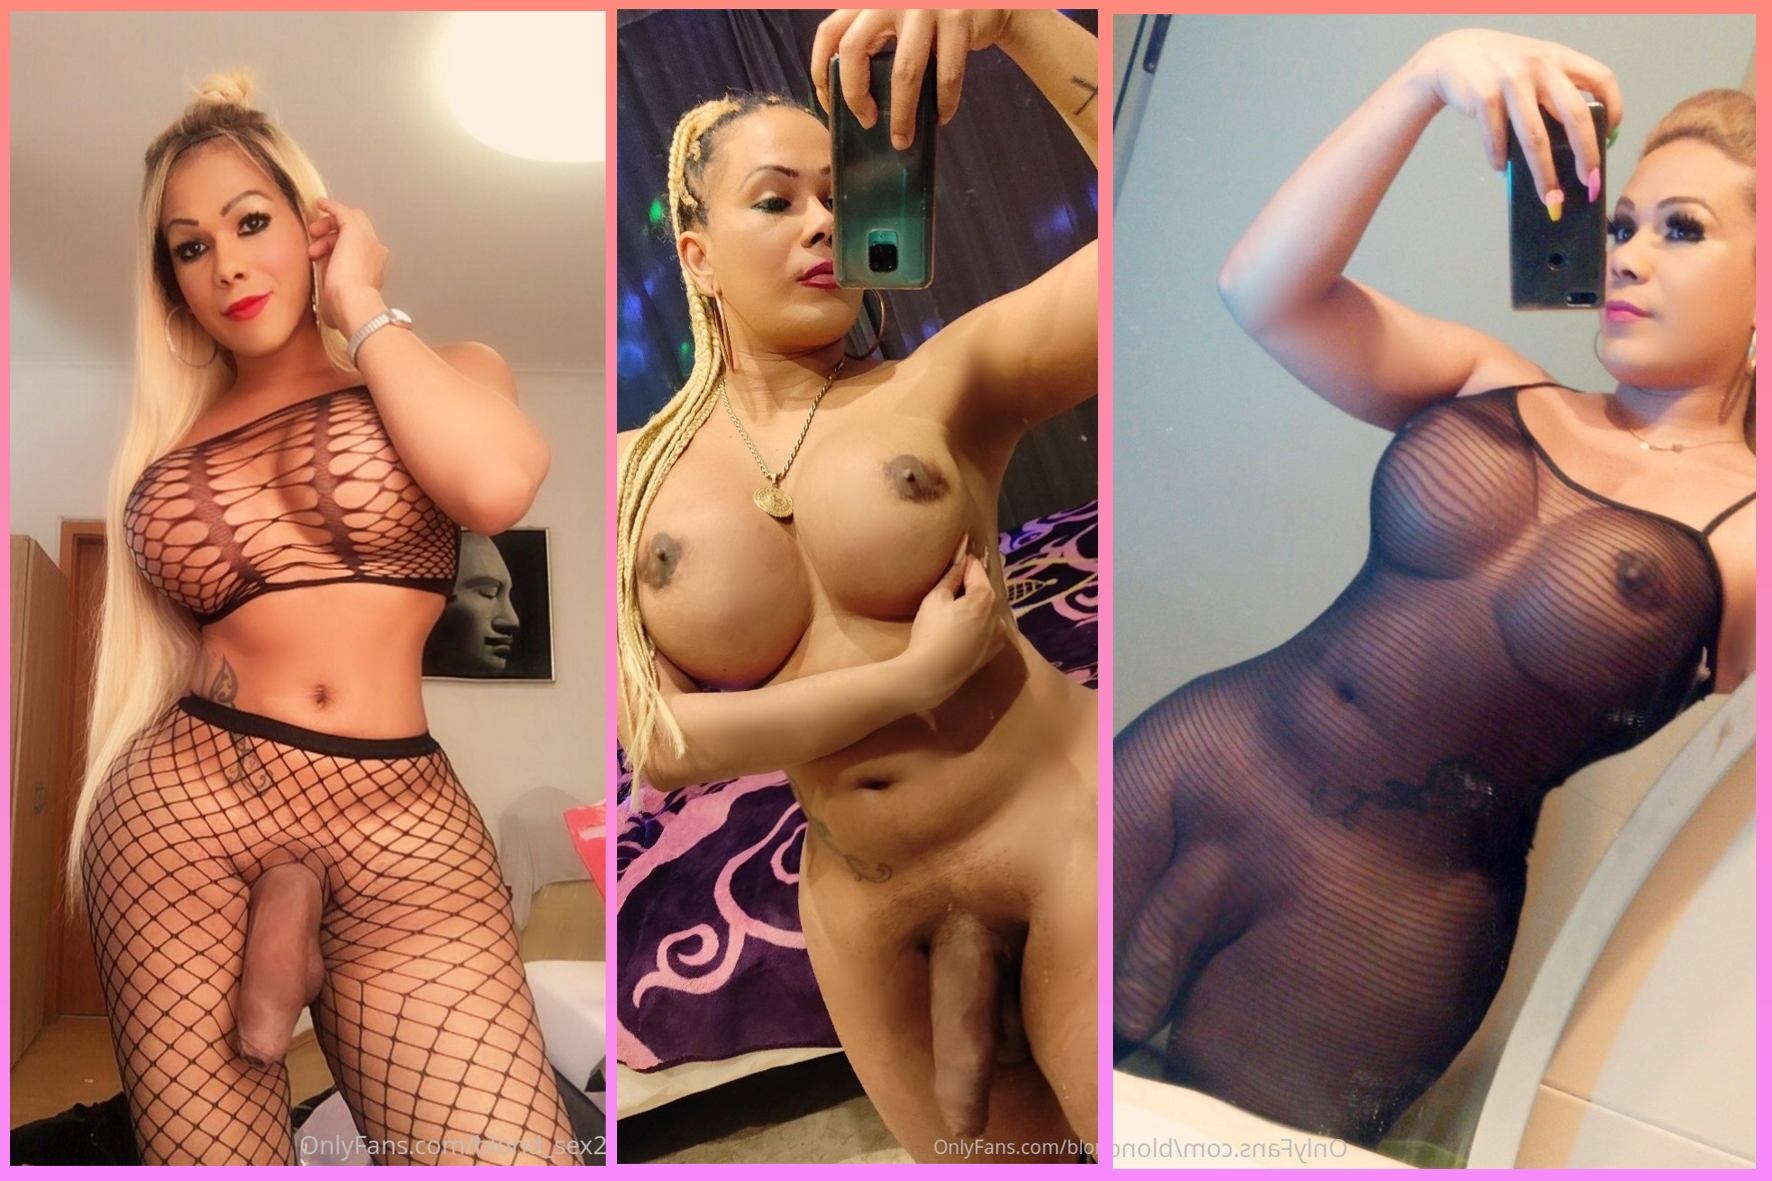 OnlyFans Shemale 💎 ORIANA FERRARI @blond_sex22 💎 – 106 Photo & 116 Videos SiteRip